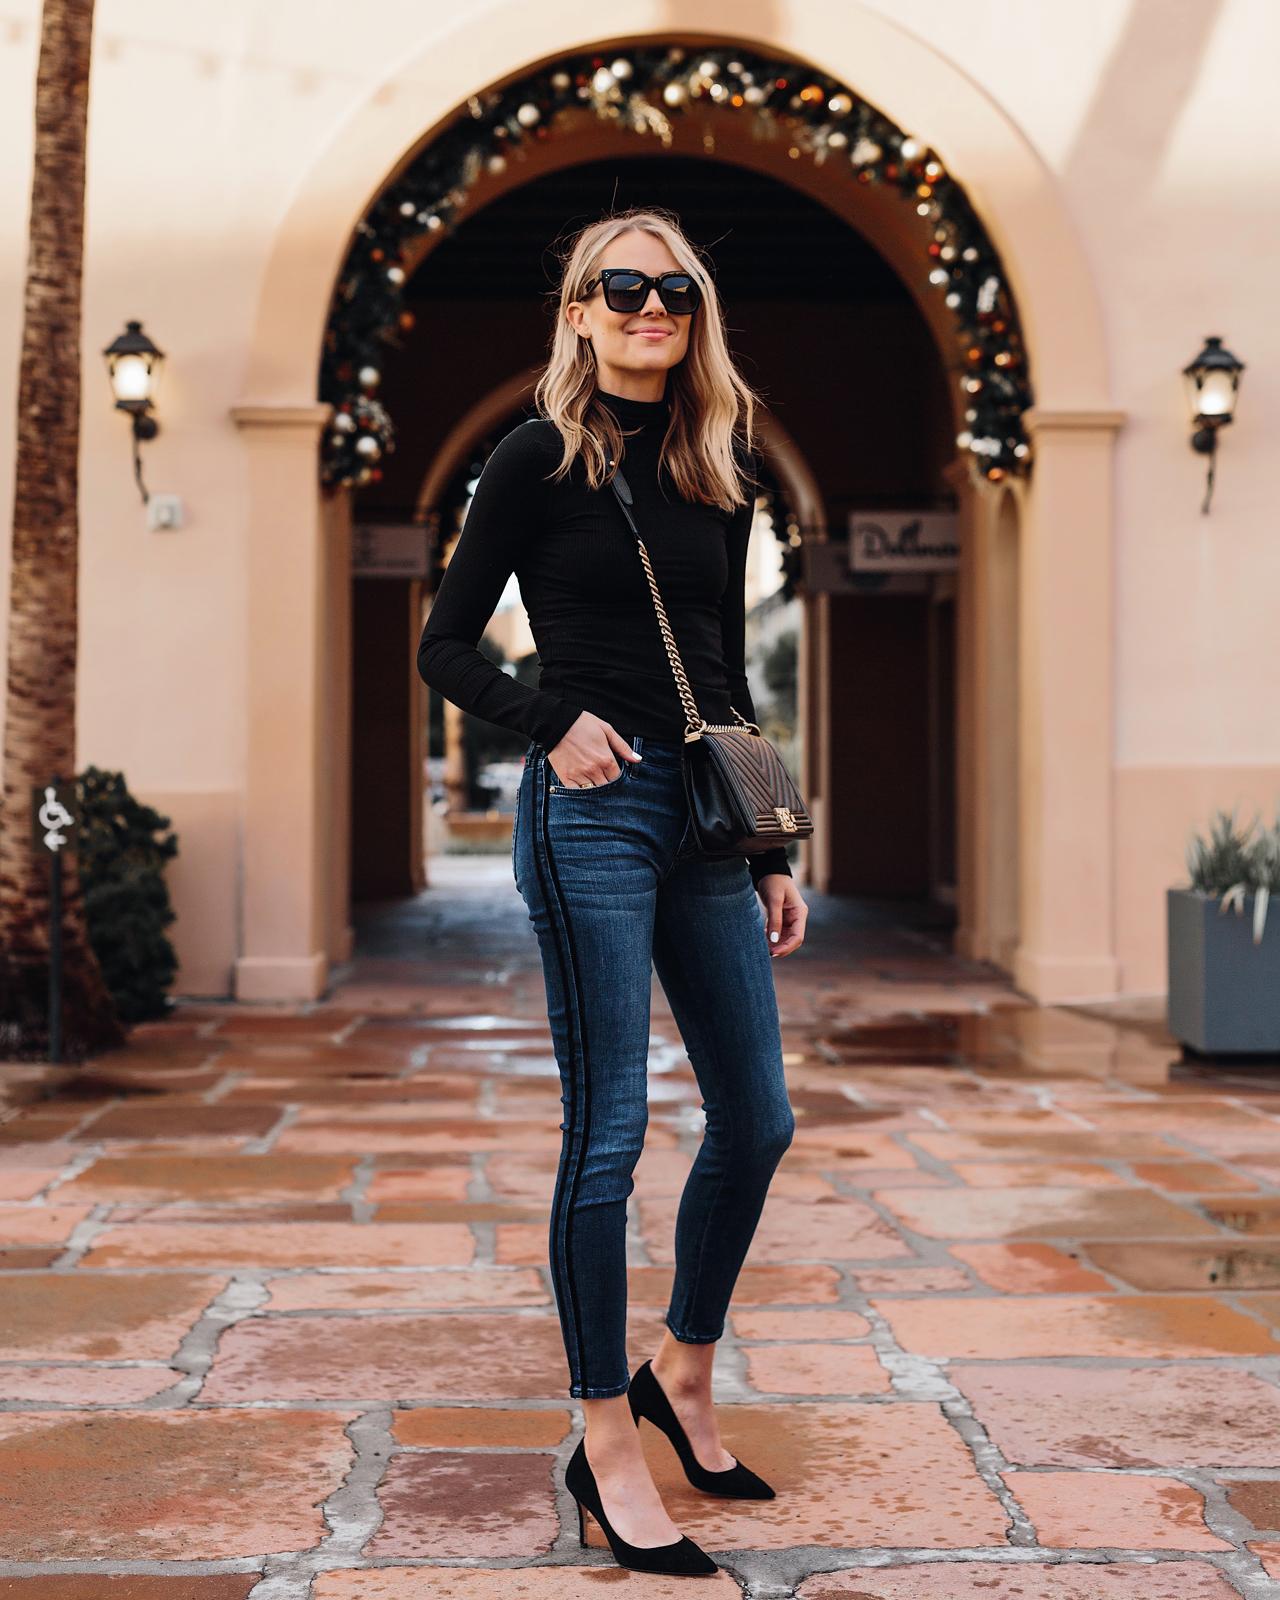 Fashion-Jackson-Wearing-Black-Turtleneck-Denim-Skinny-Jeans-Black-Pumps-Chanel-Boy-Bag